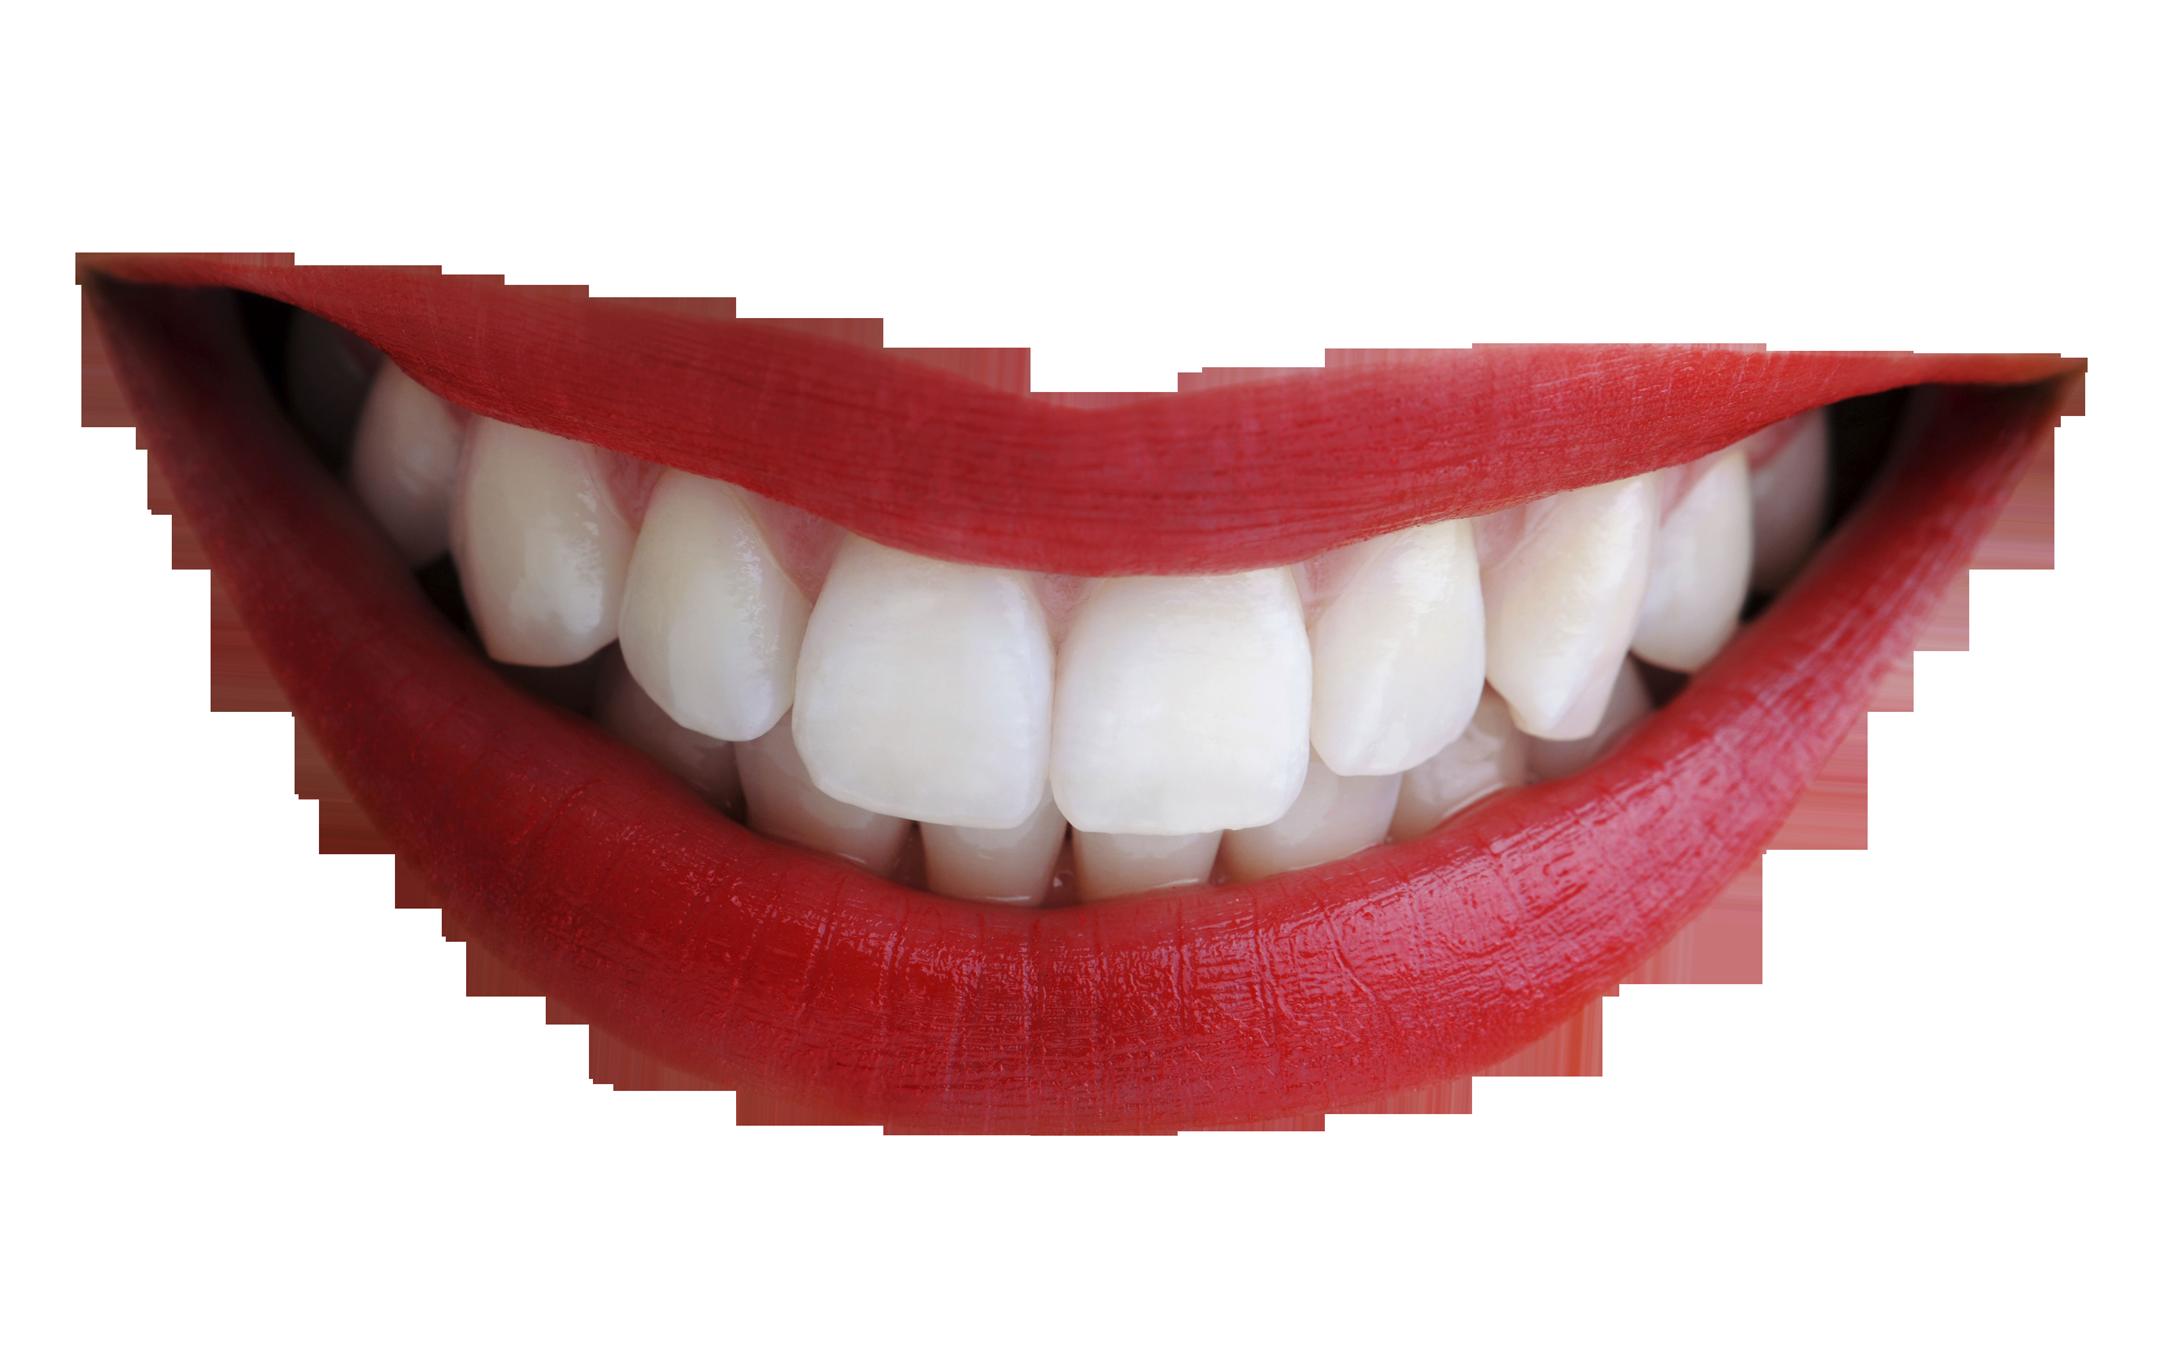 Teeth Smile Png Hd - Teeth Png Transparent Image   Smile Lips Png   Png Hd Teeth Smile, Transparent background PNG HD thumbnail